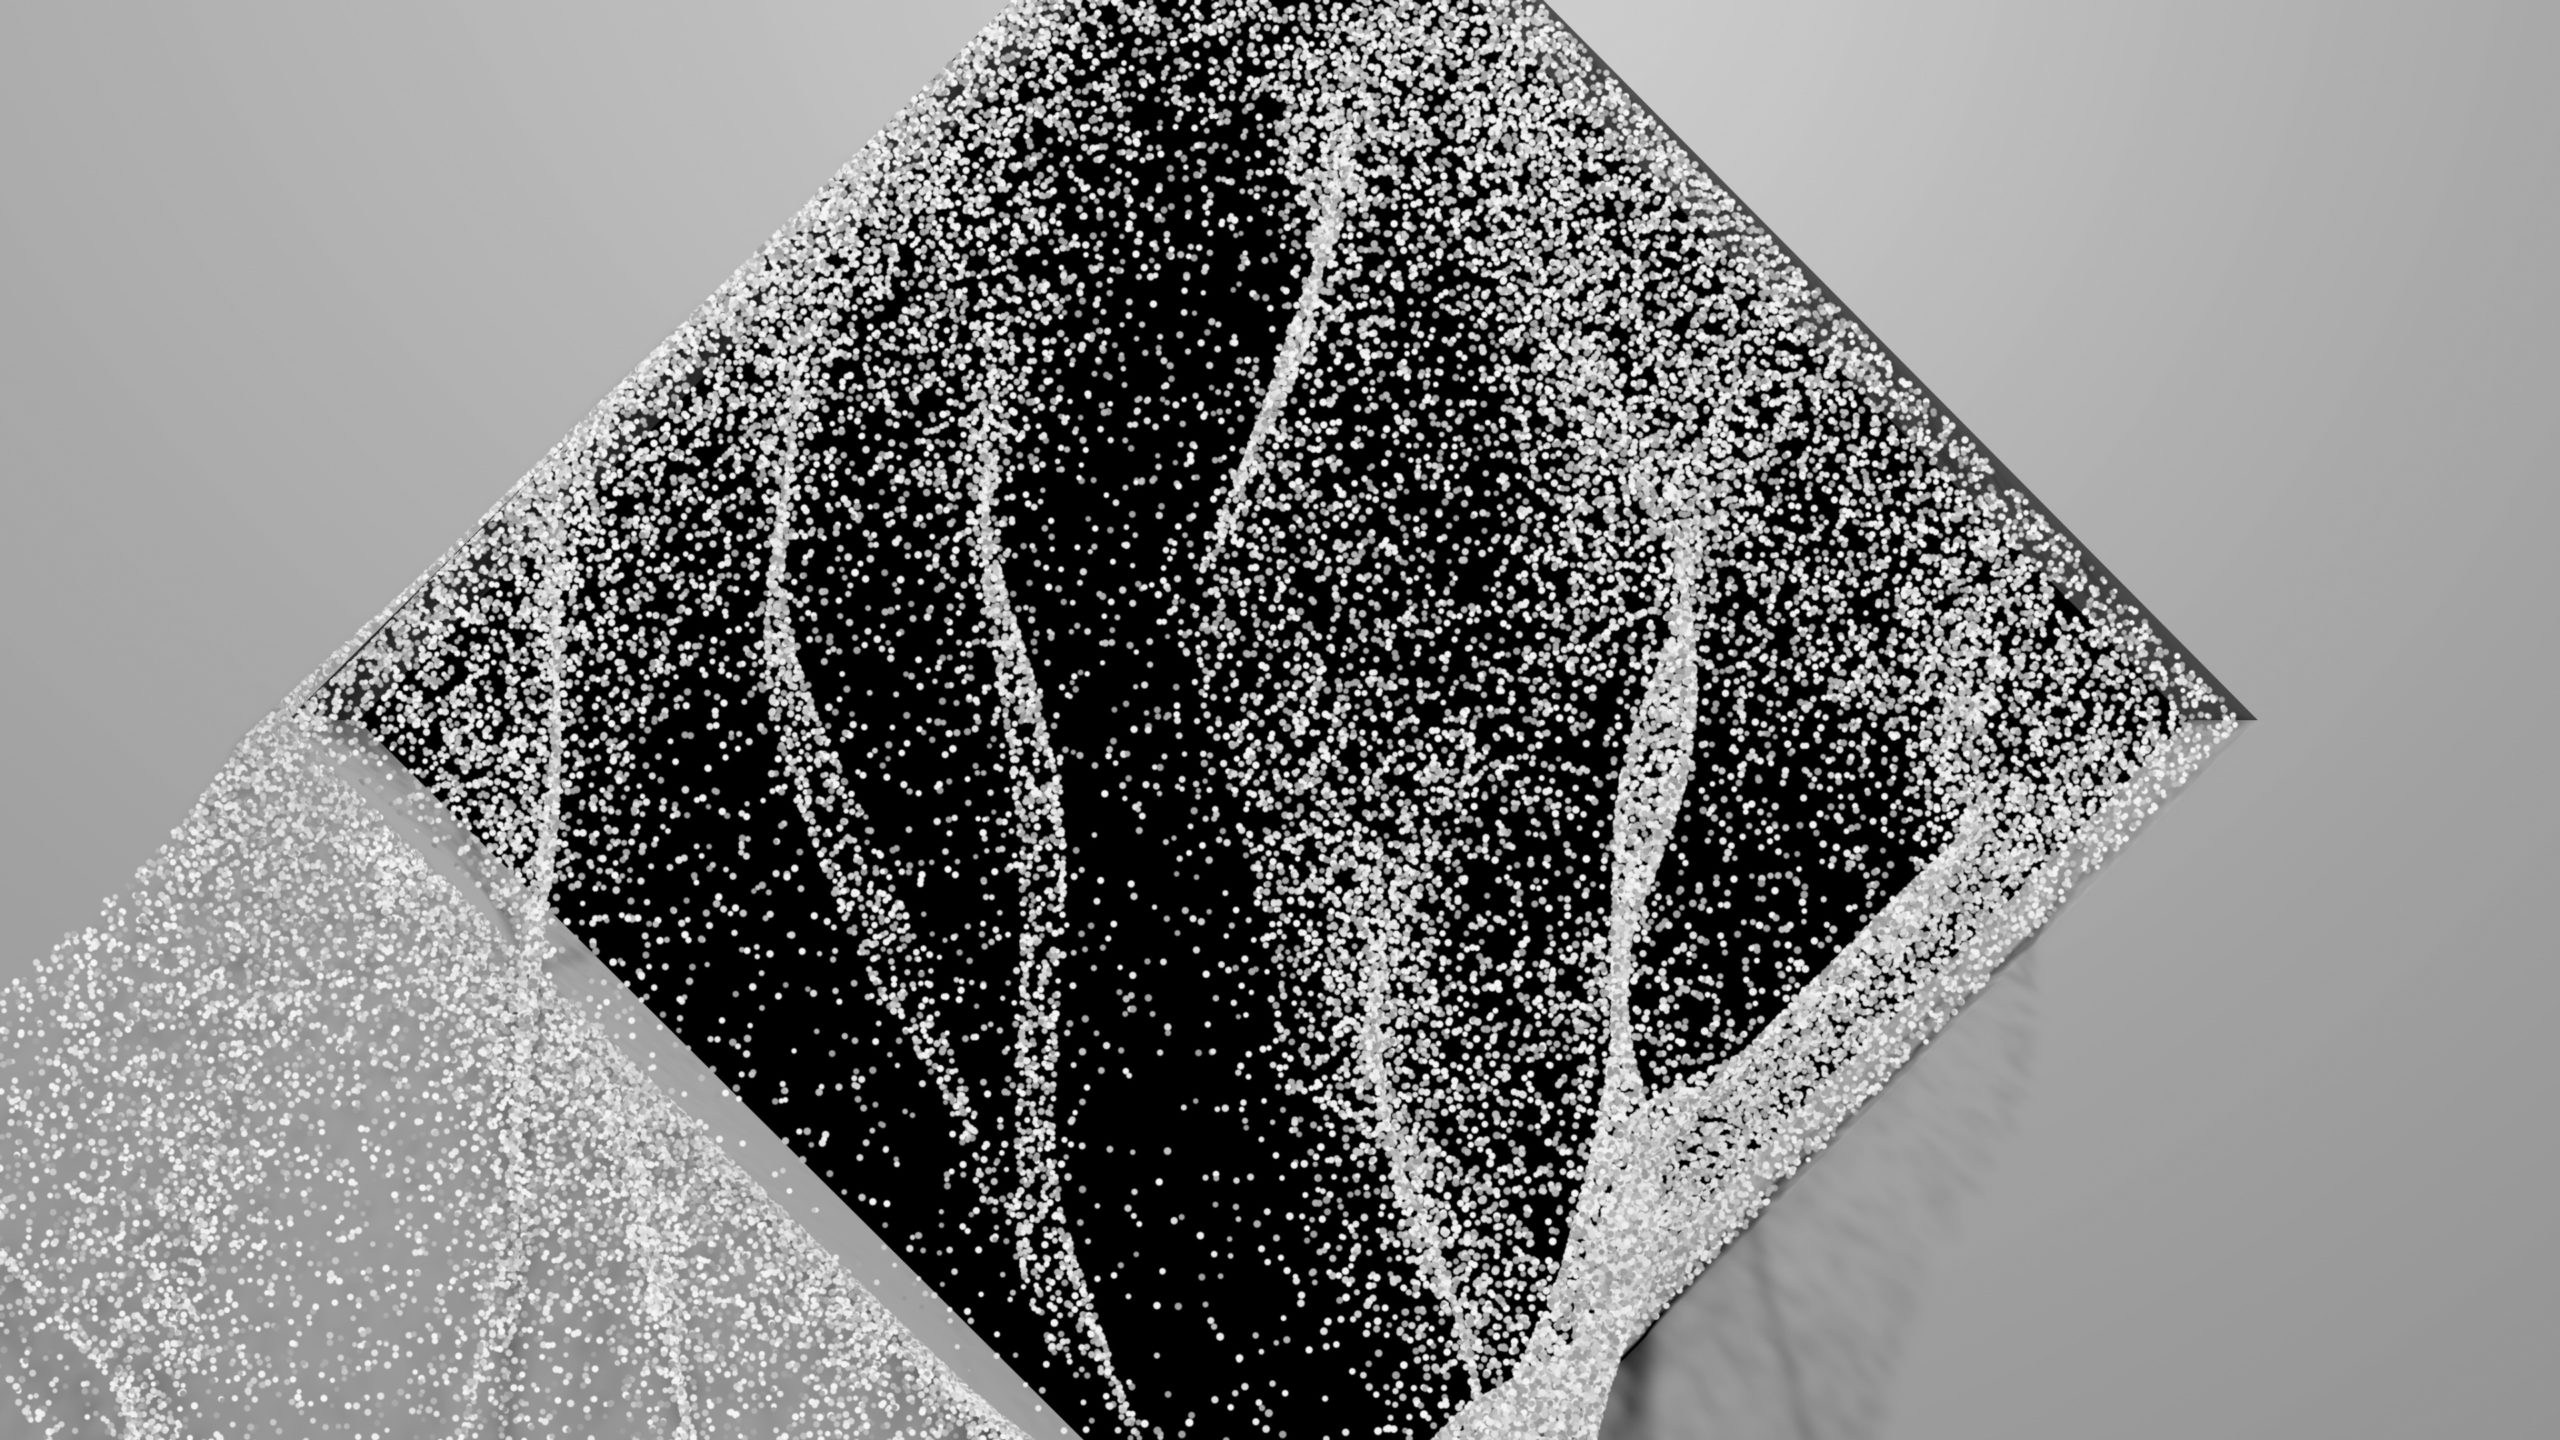 sand looped animation